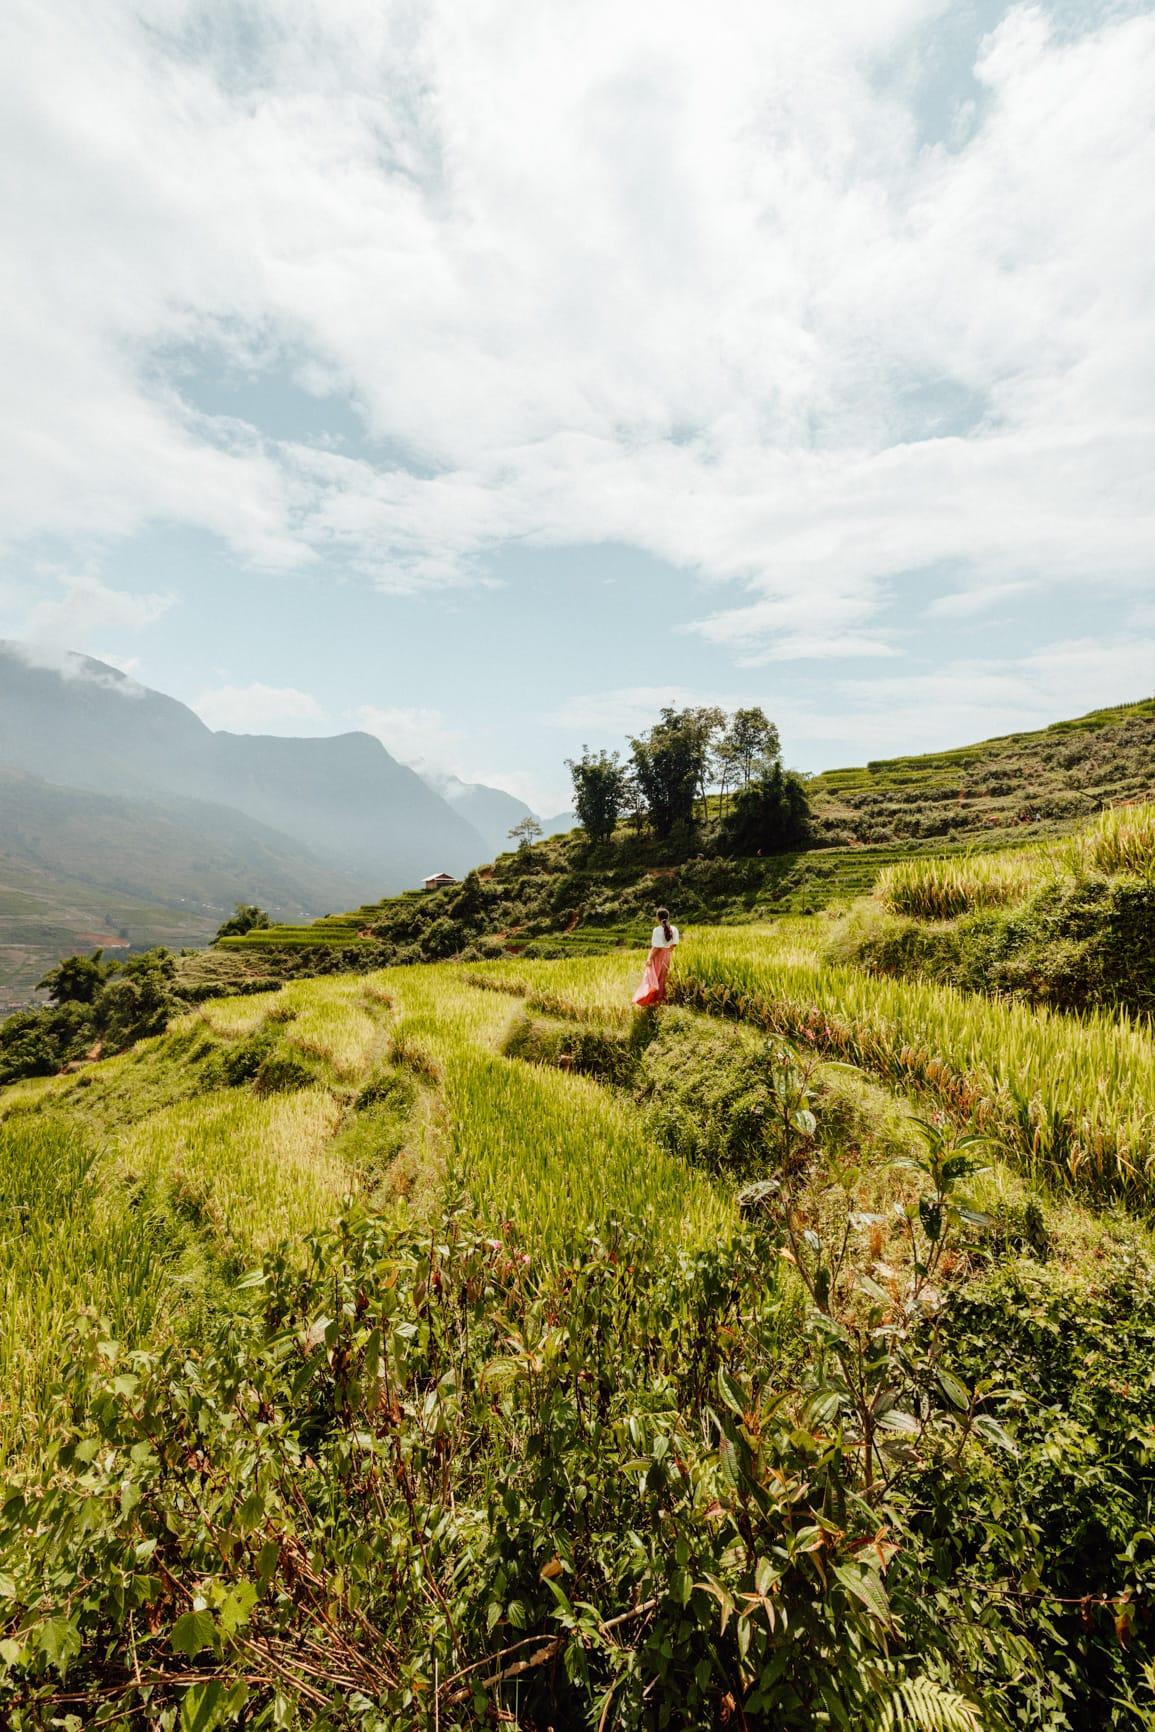 hiking in sapa rice fields